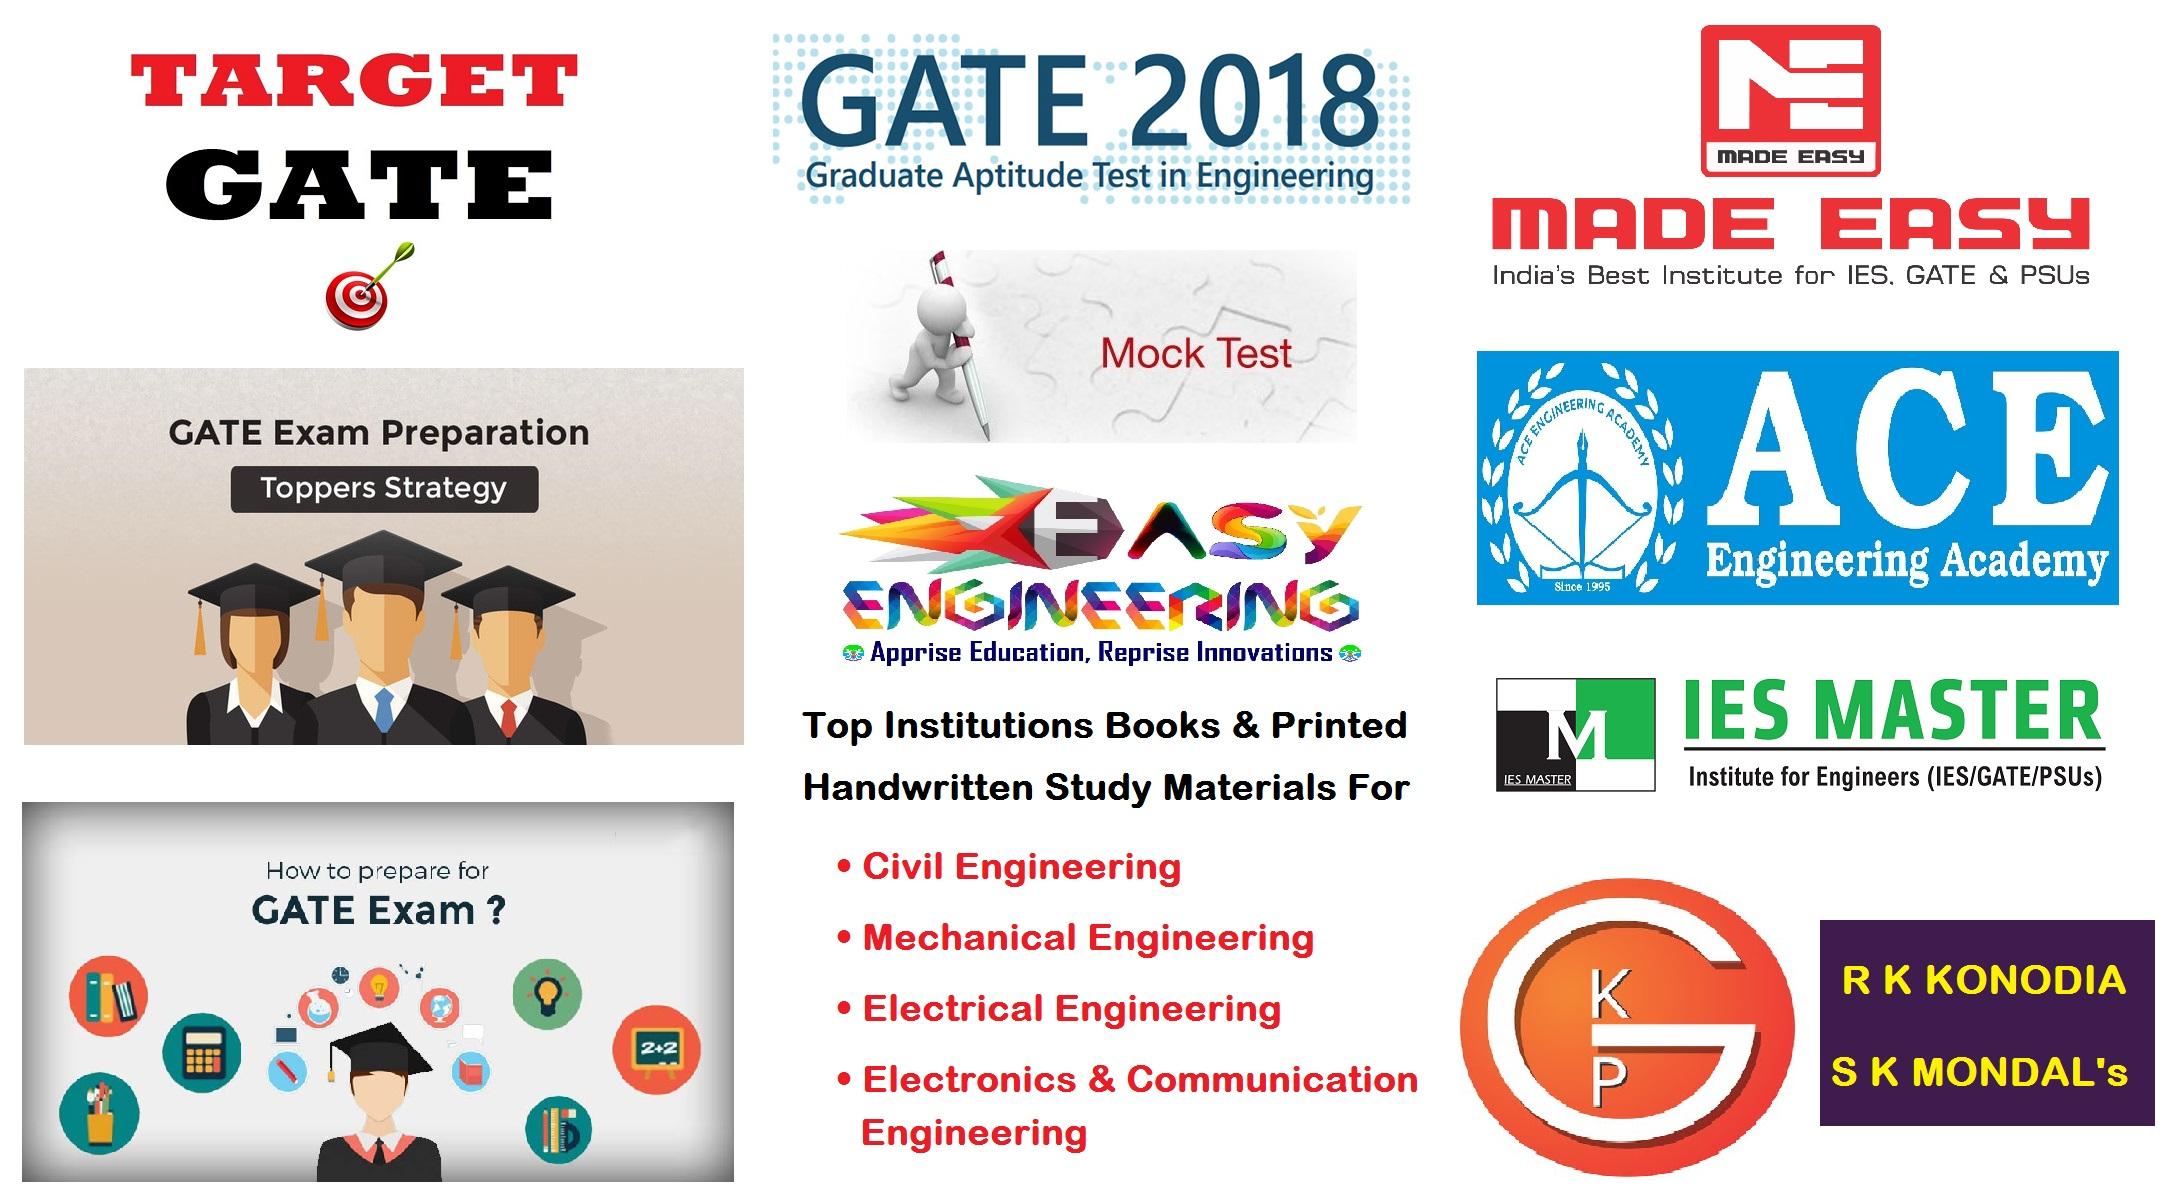 GATE Exams Study Materials – EasyEngineering